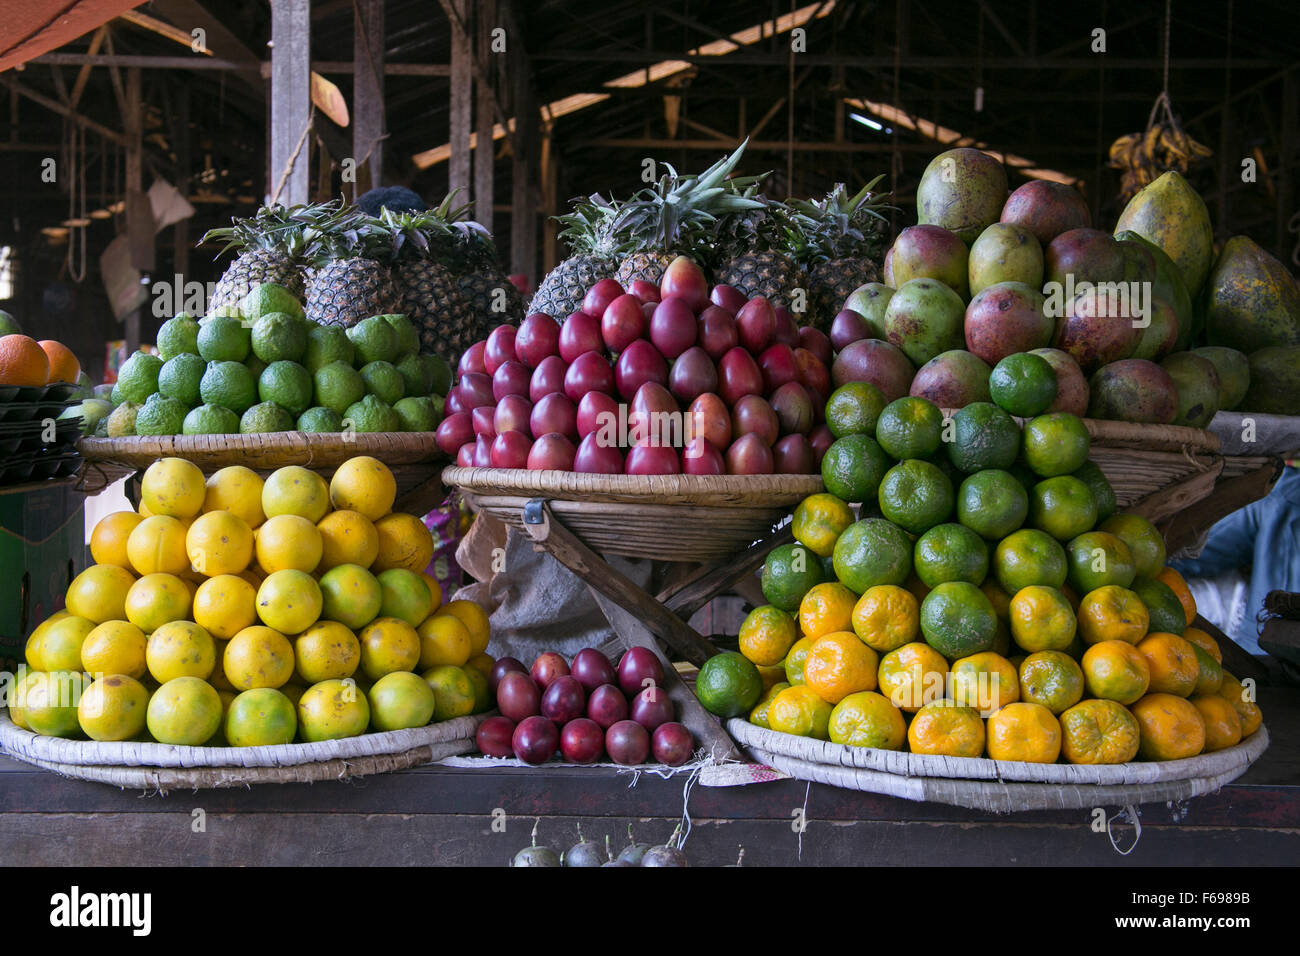 Produce market in Rwanda. - Stock Image